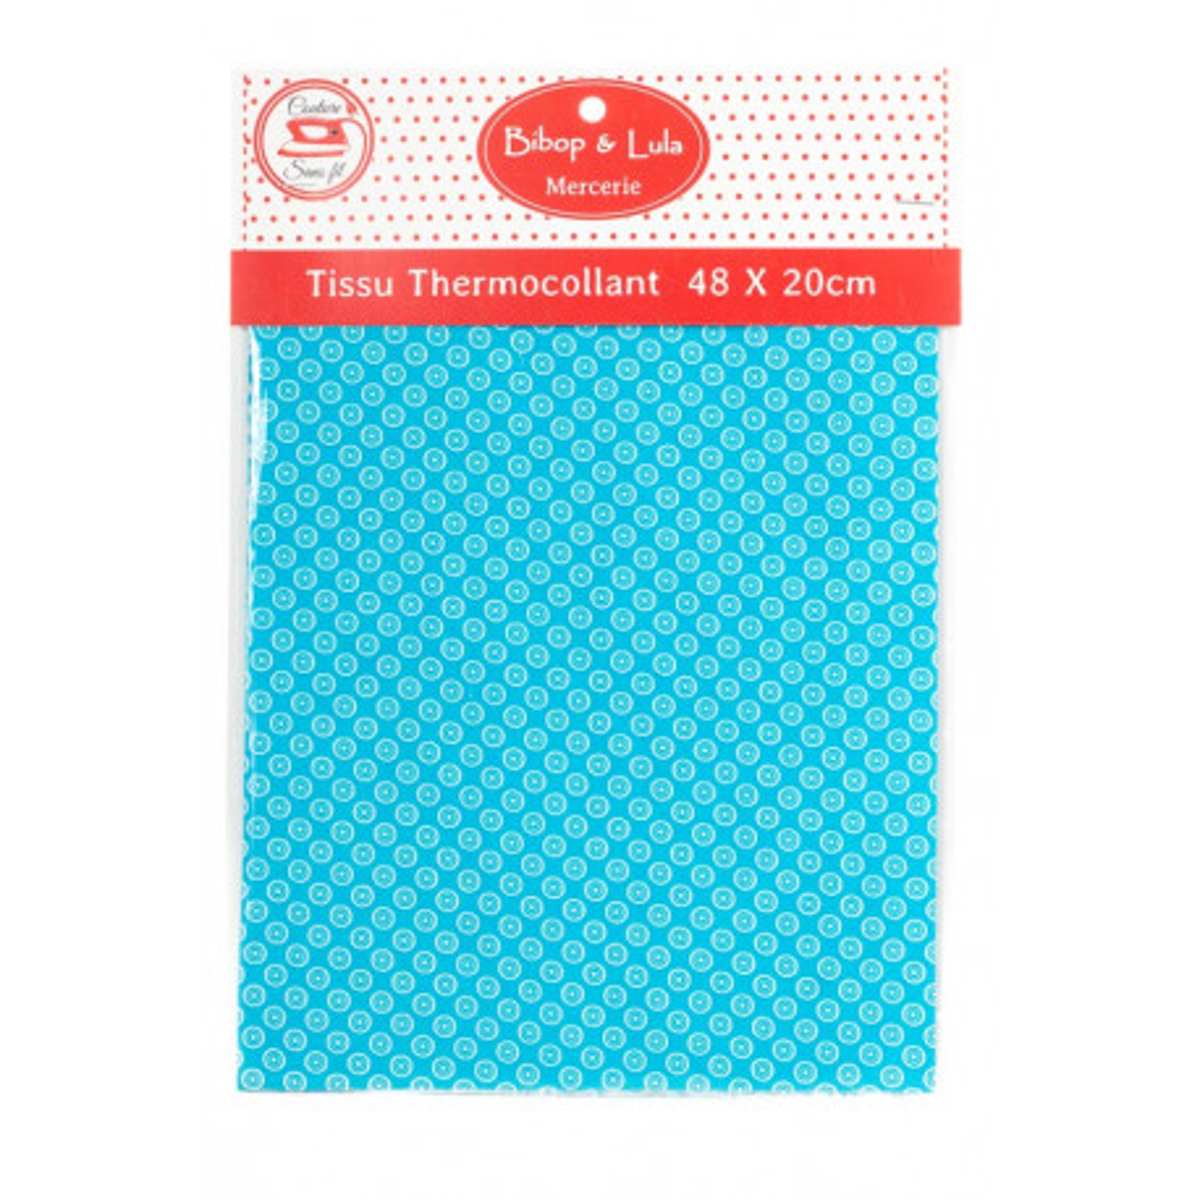 Tissu thermocollant Light blue round